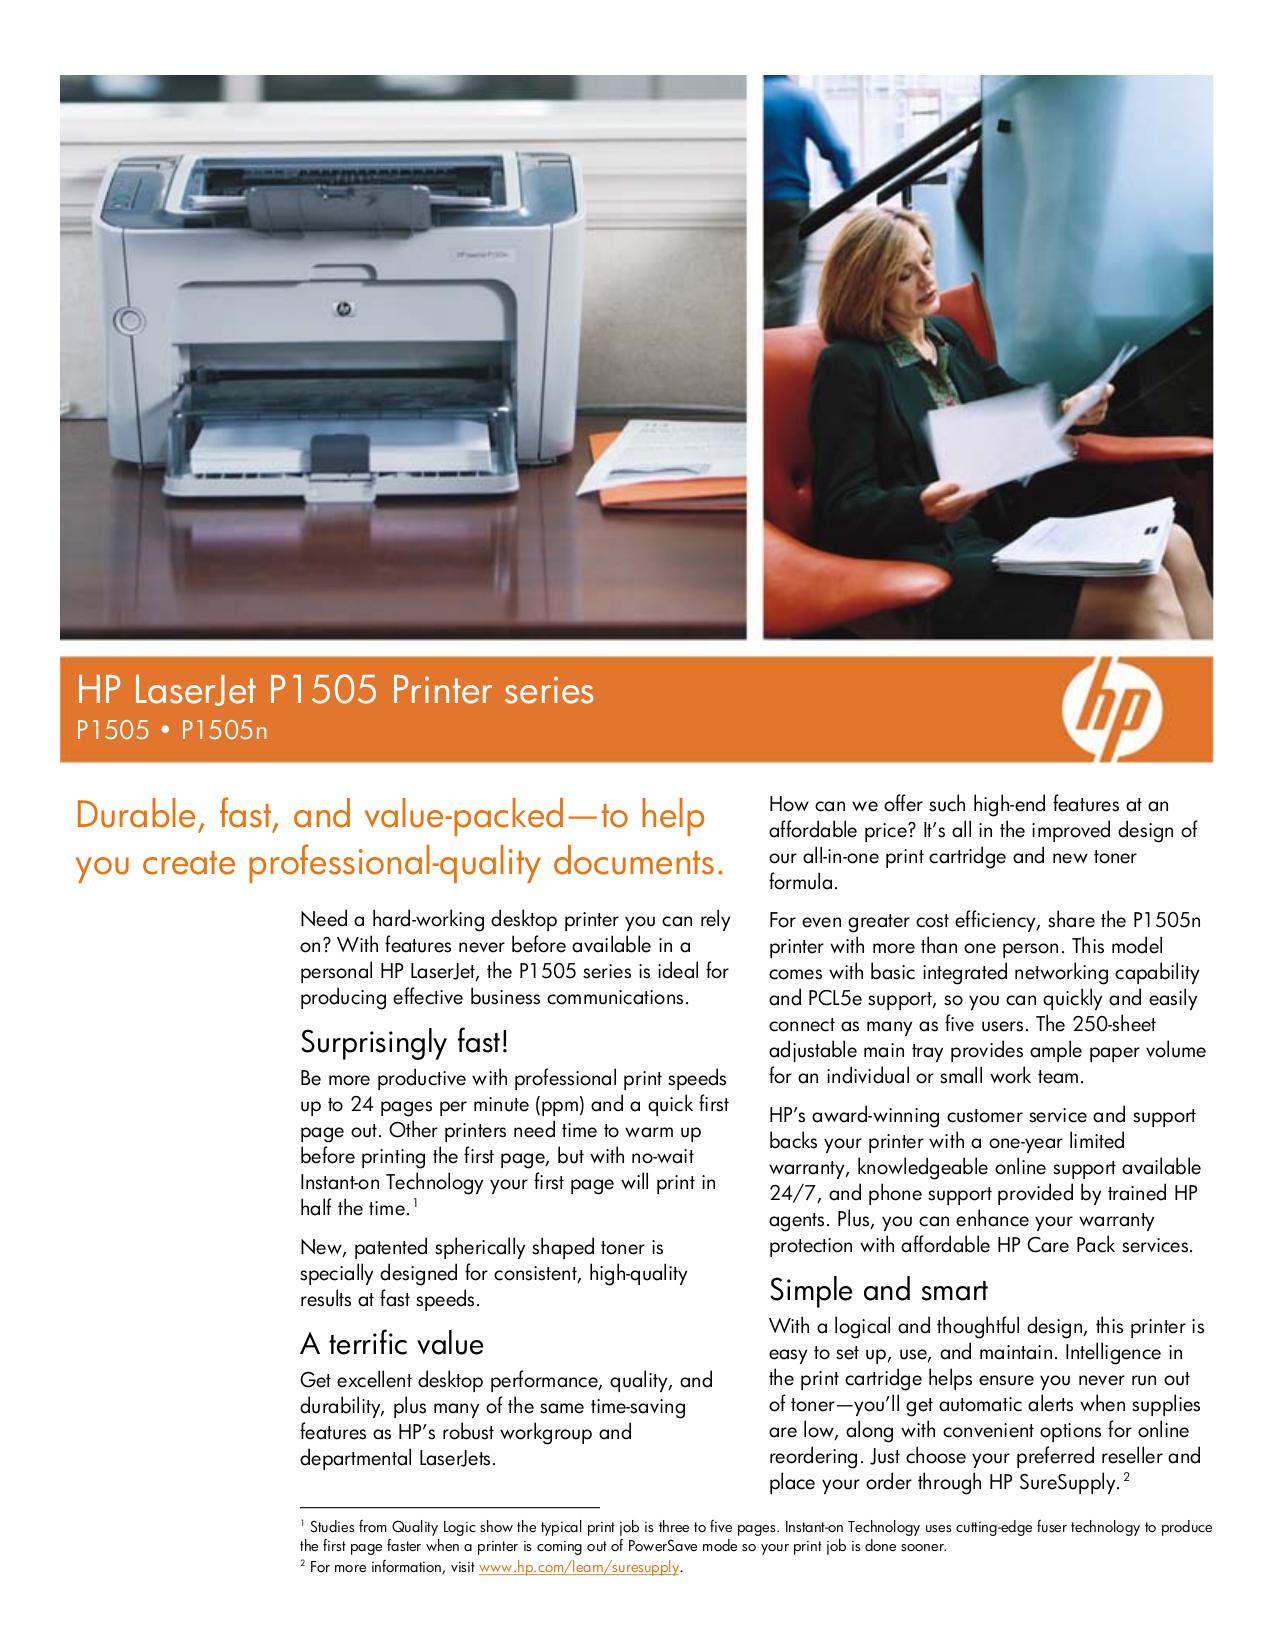 download free pdf for hp laserjet color laserjet p1505 printer manual rh umlib com hp laserjet p1505 printer driver free download hp laserjet p1505 printer driver free download for windows 7